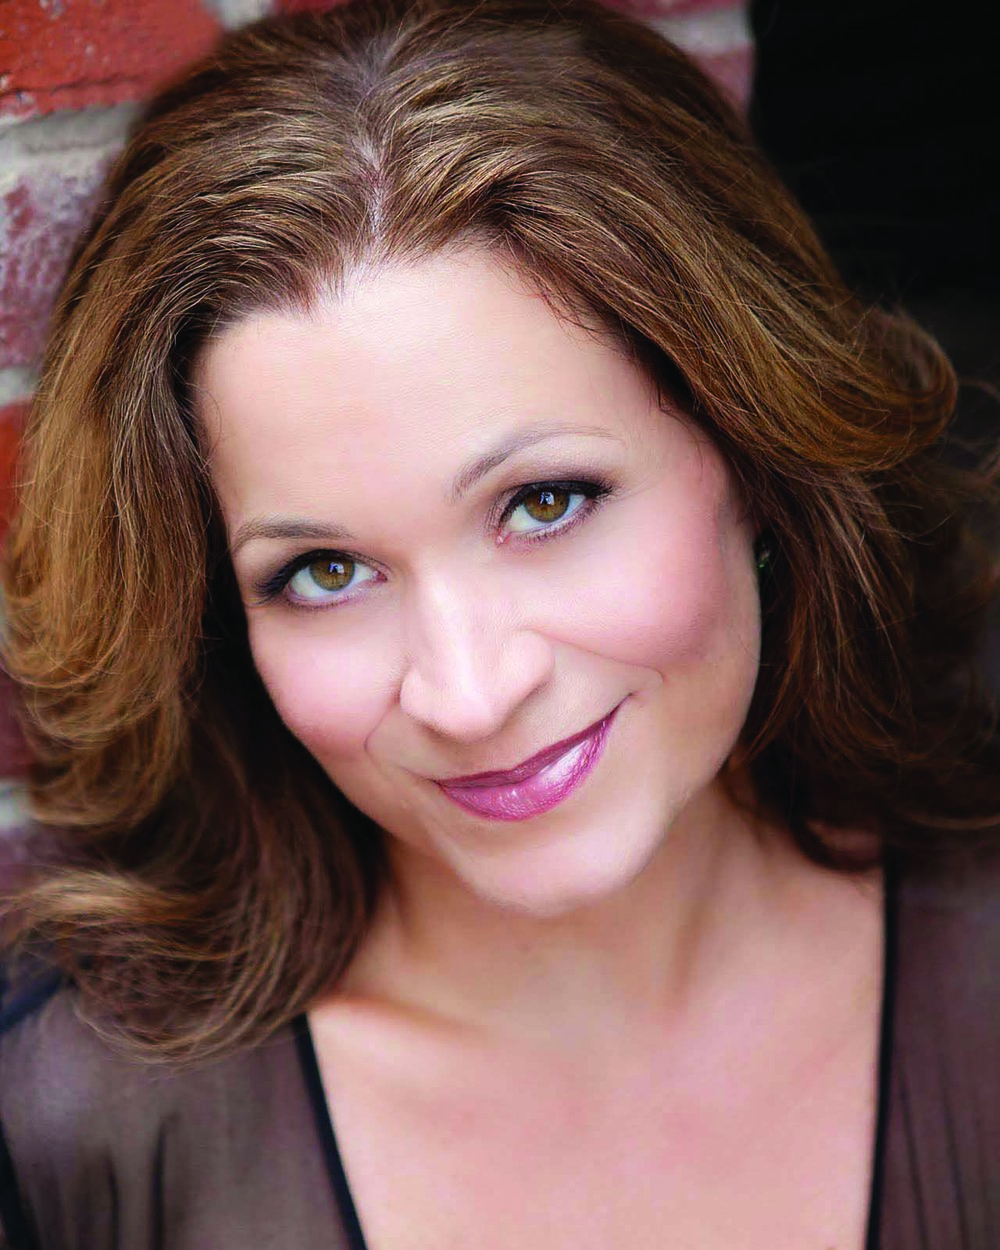 Soprano soloist Sari Gruber